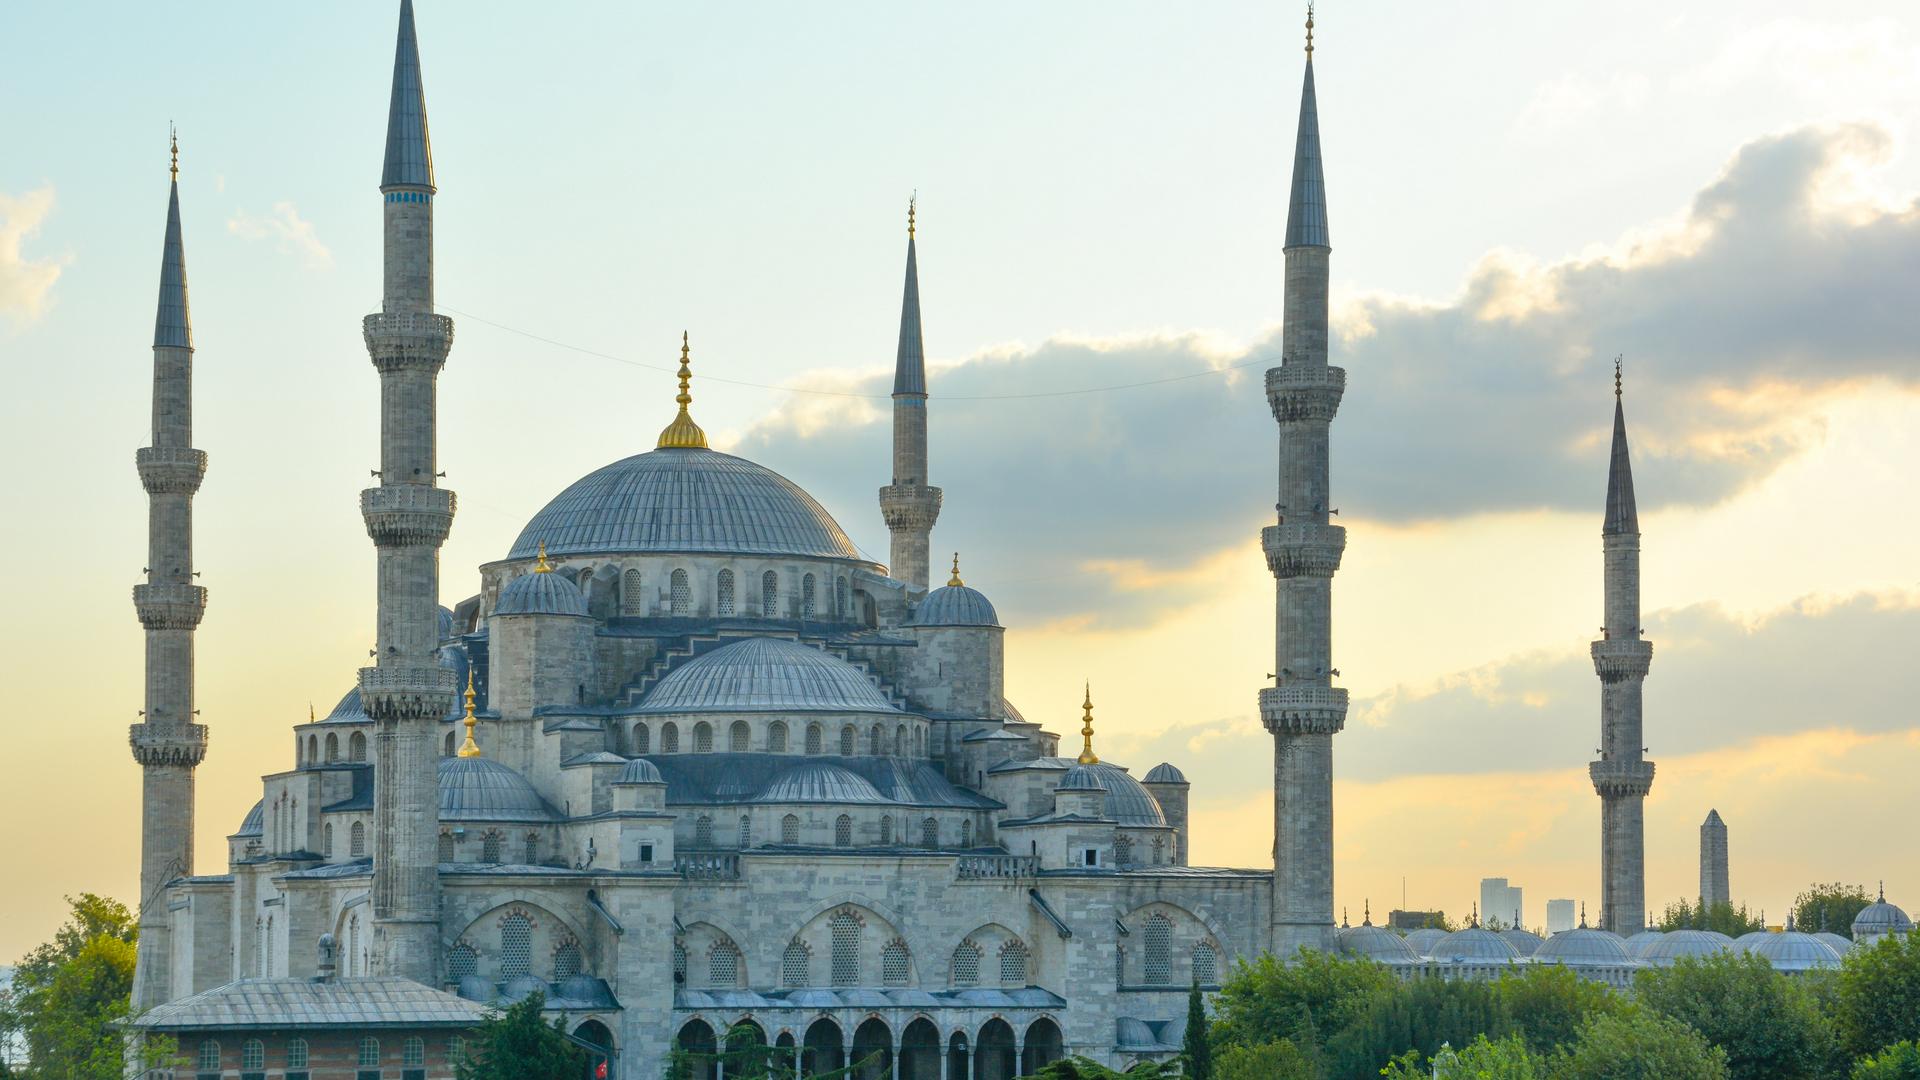 A view in Turkey